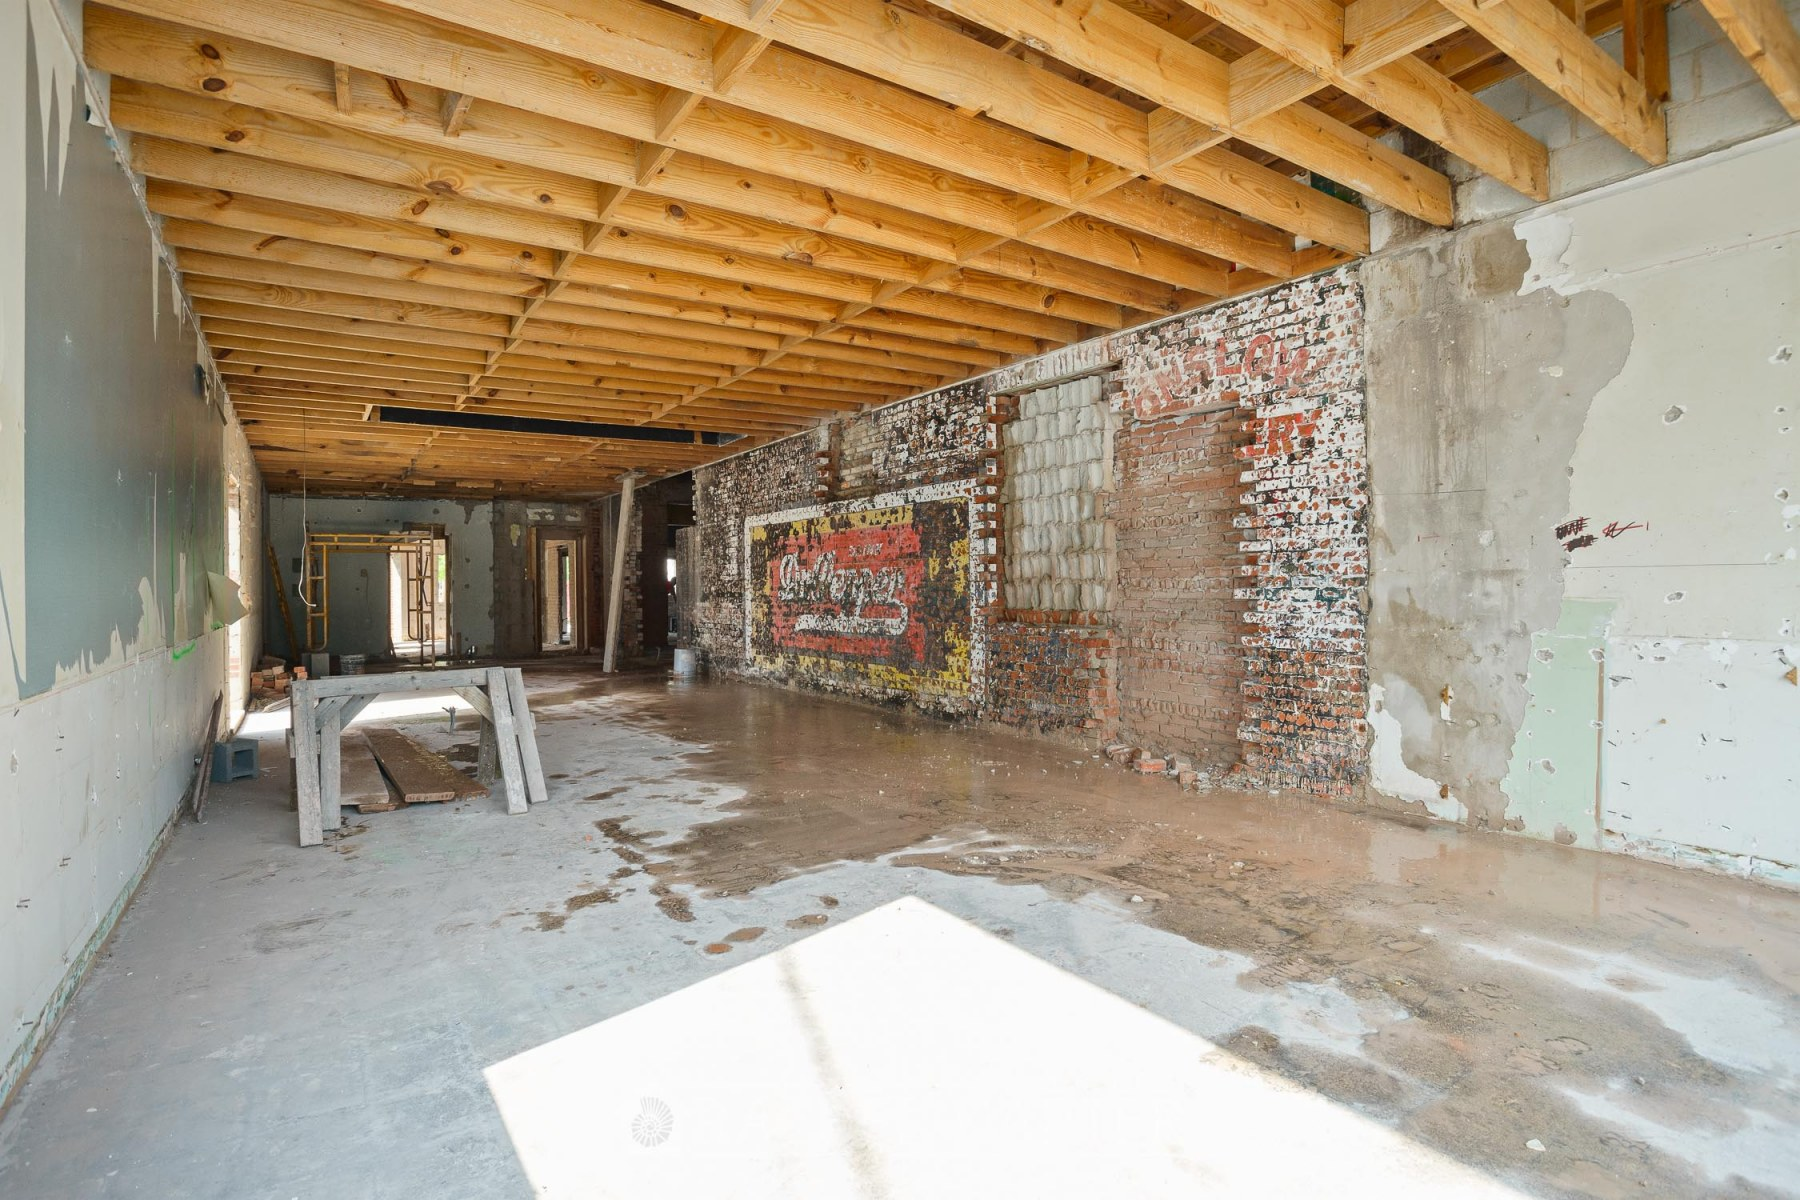 Horizons-East-Office-Renovation-1st-Set-27May2021_SB_01267_web-size